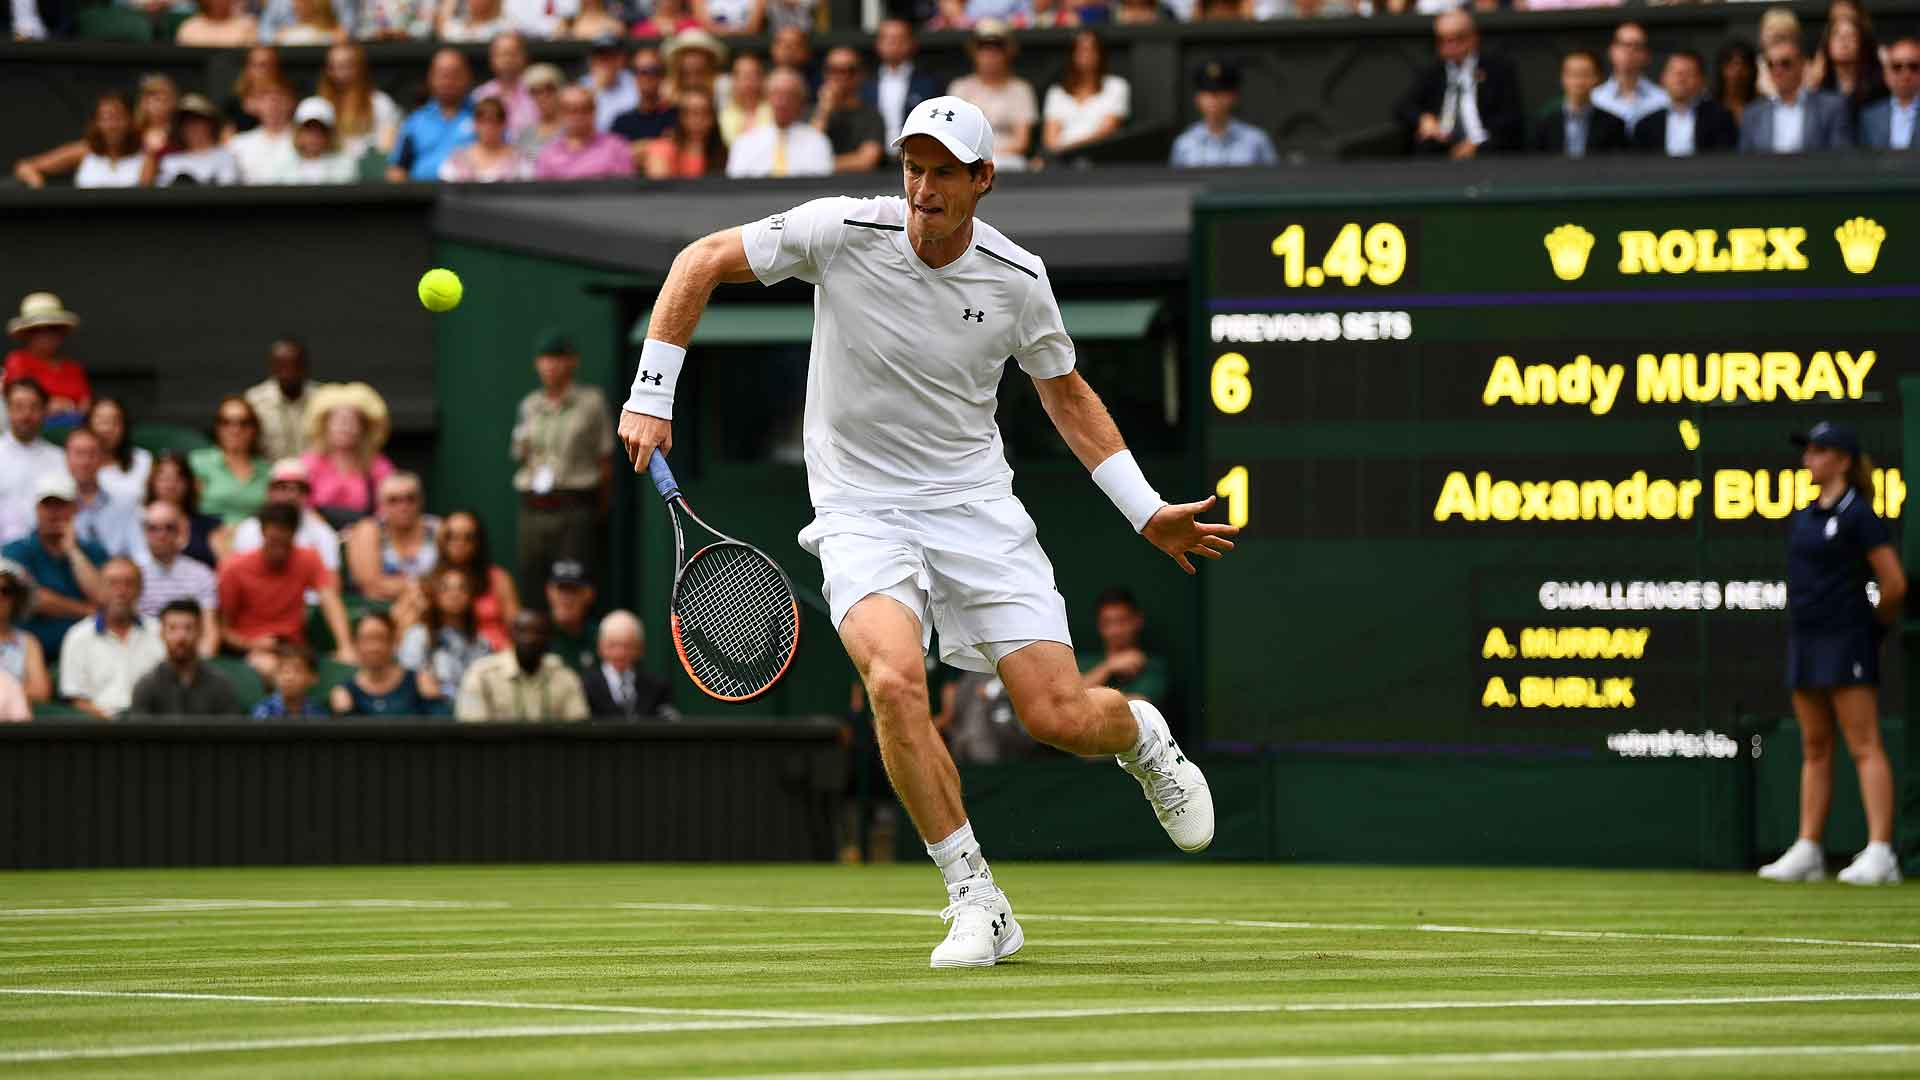 Title defence underway! Murray beats Bublik to set a #Wimbledon R2 clash vs Brown. More: https://t.co/88zxnTcj8s https://t.co/BL8QnUk5hz